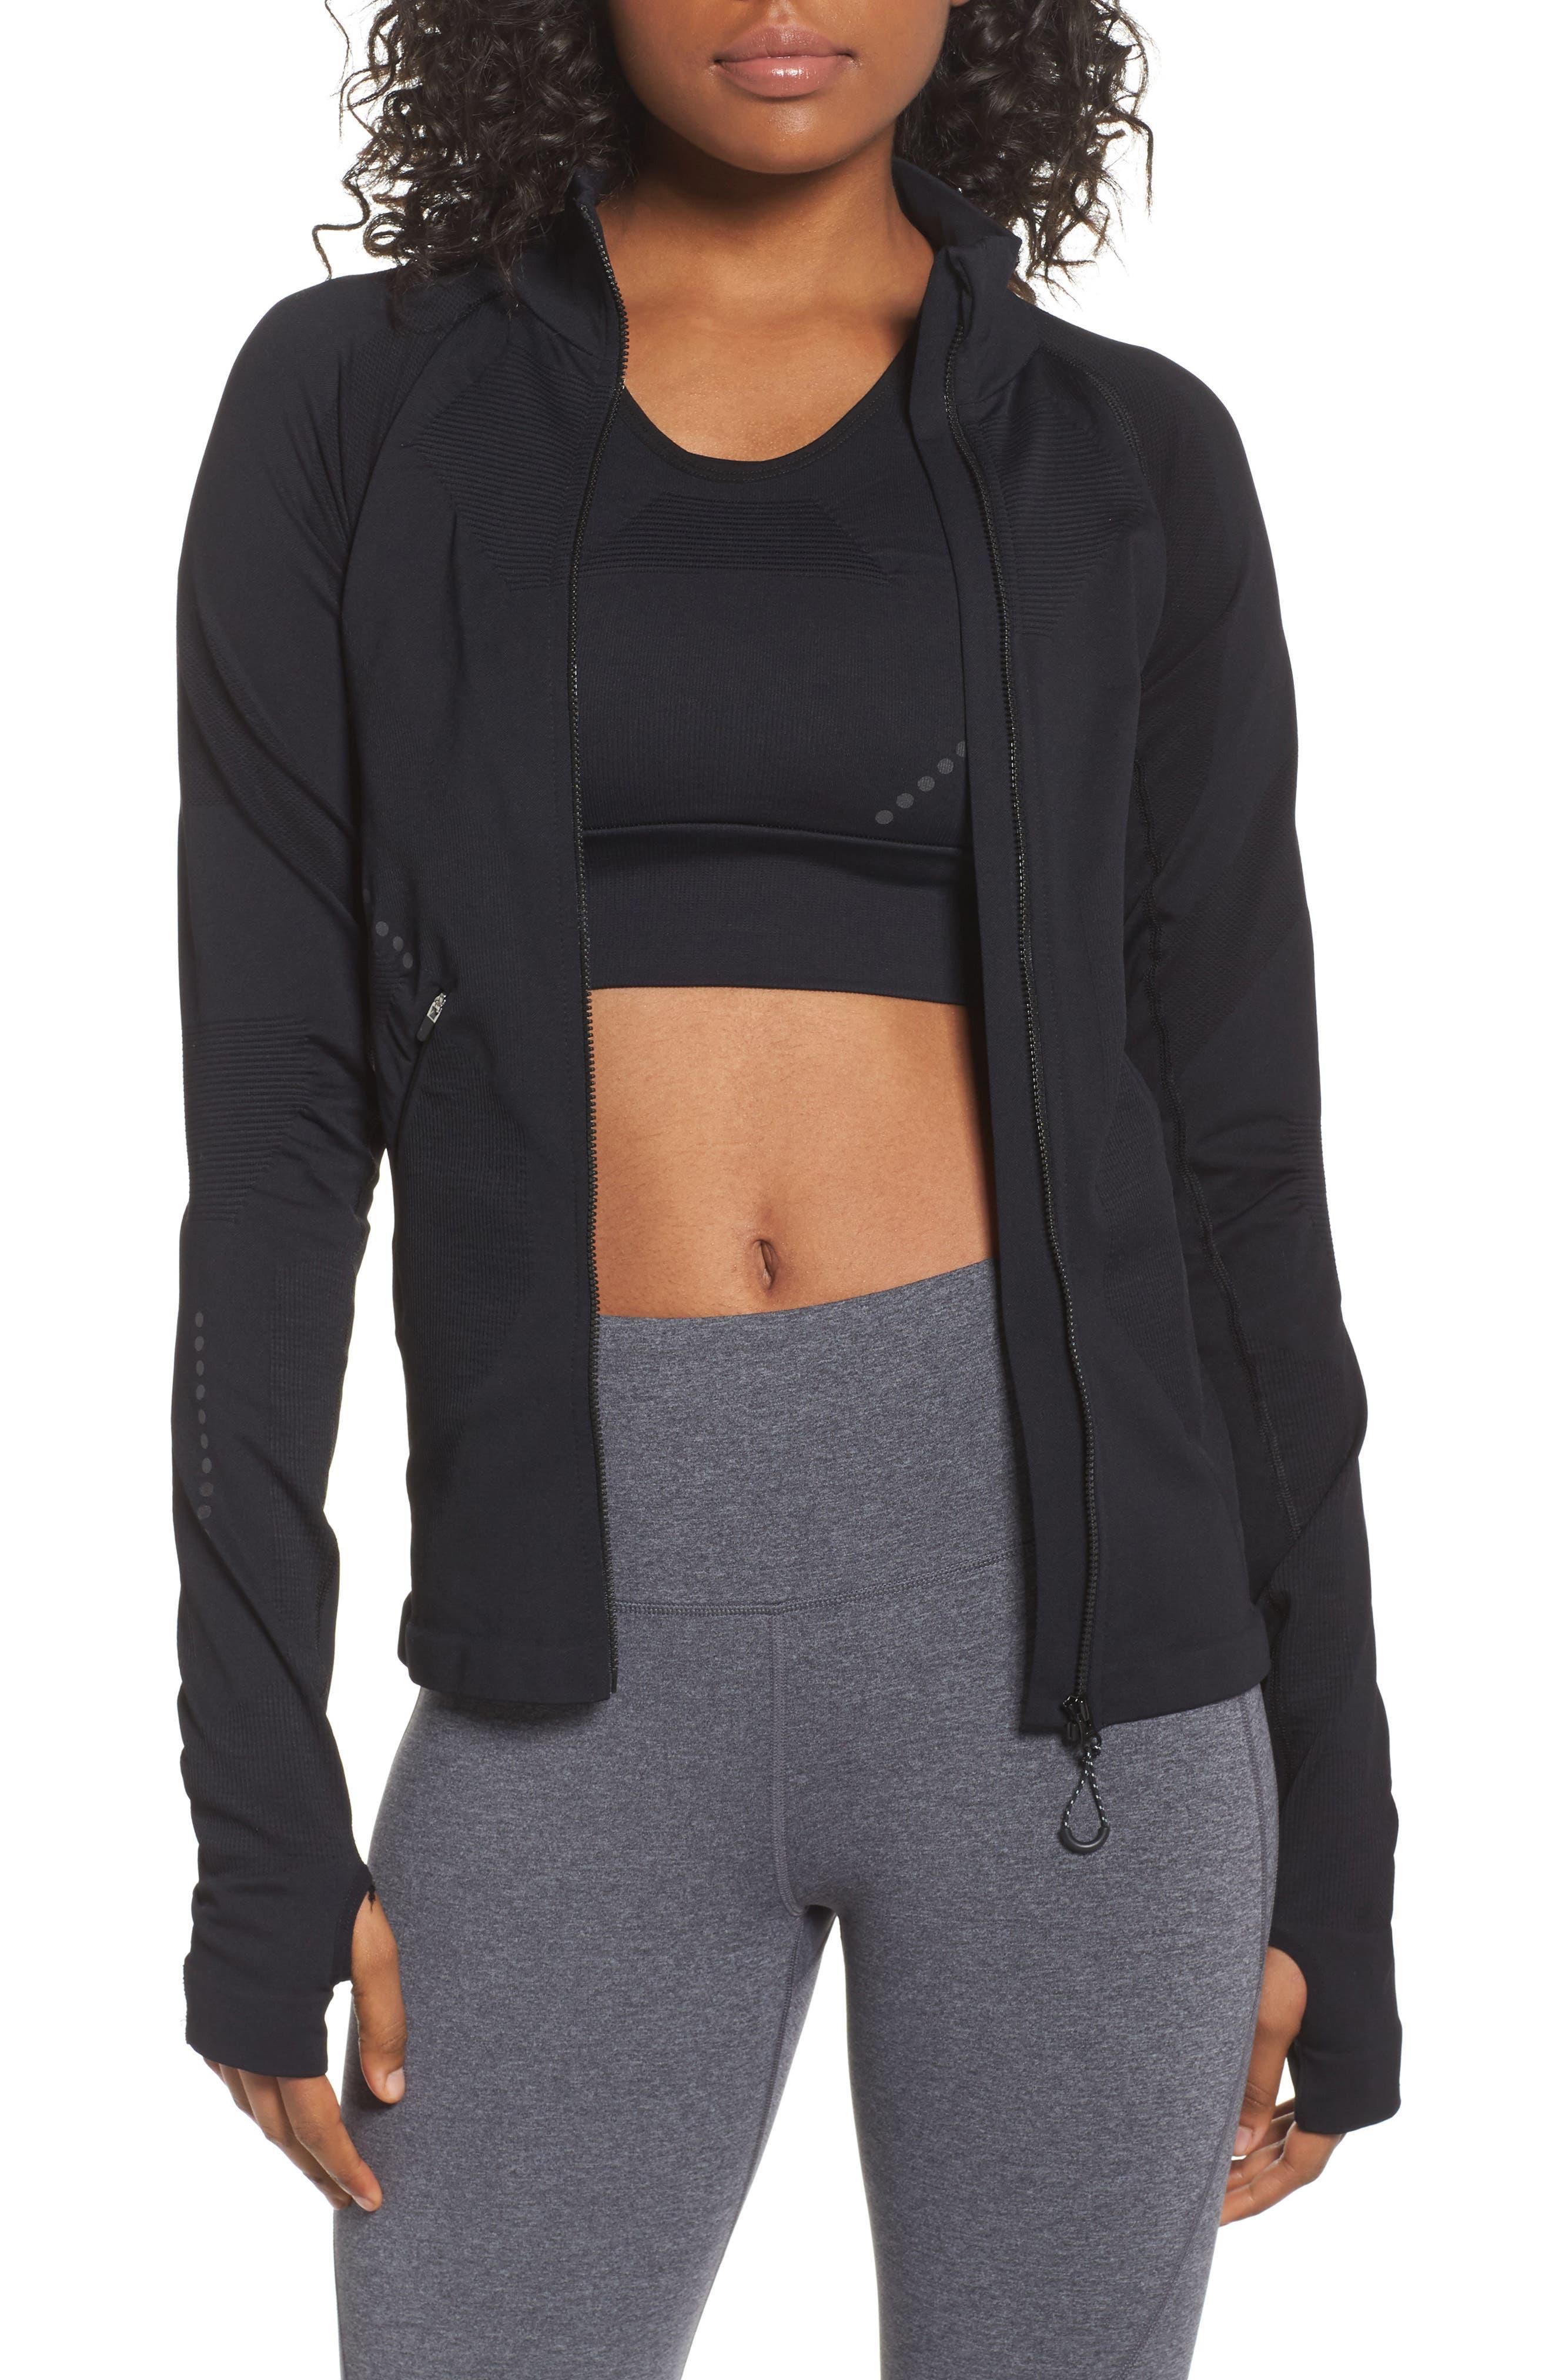 Blackout Jacket,                         Main,                         color, Black